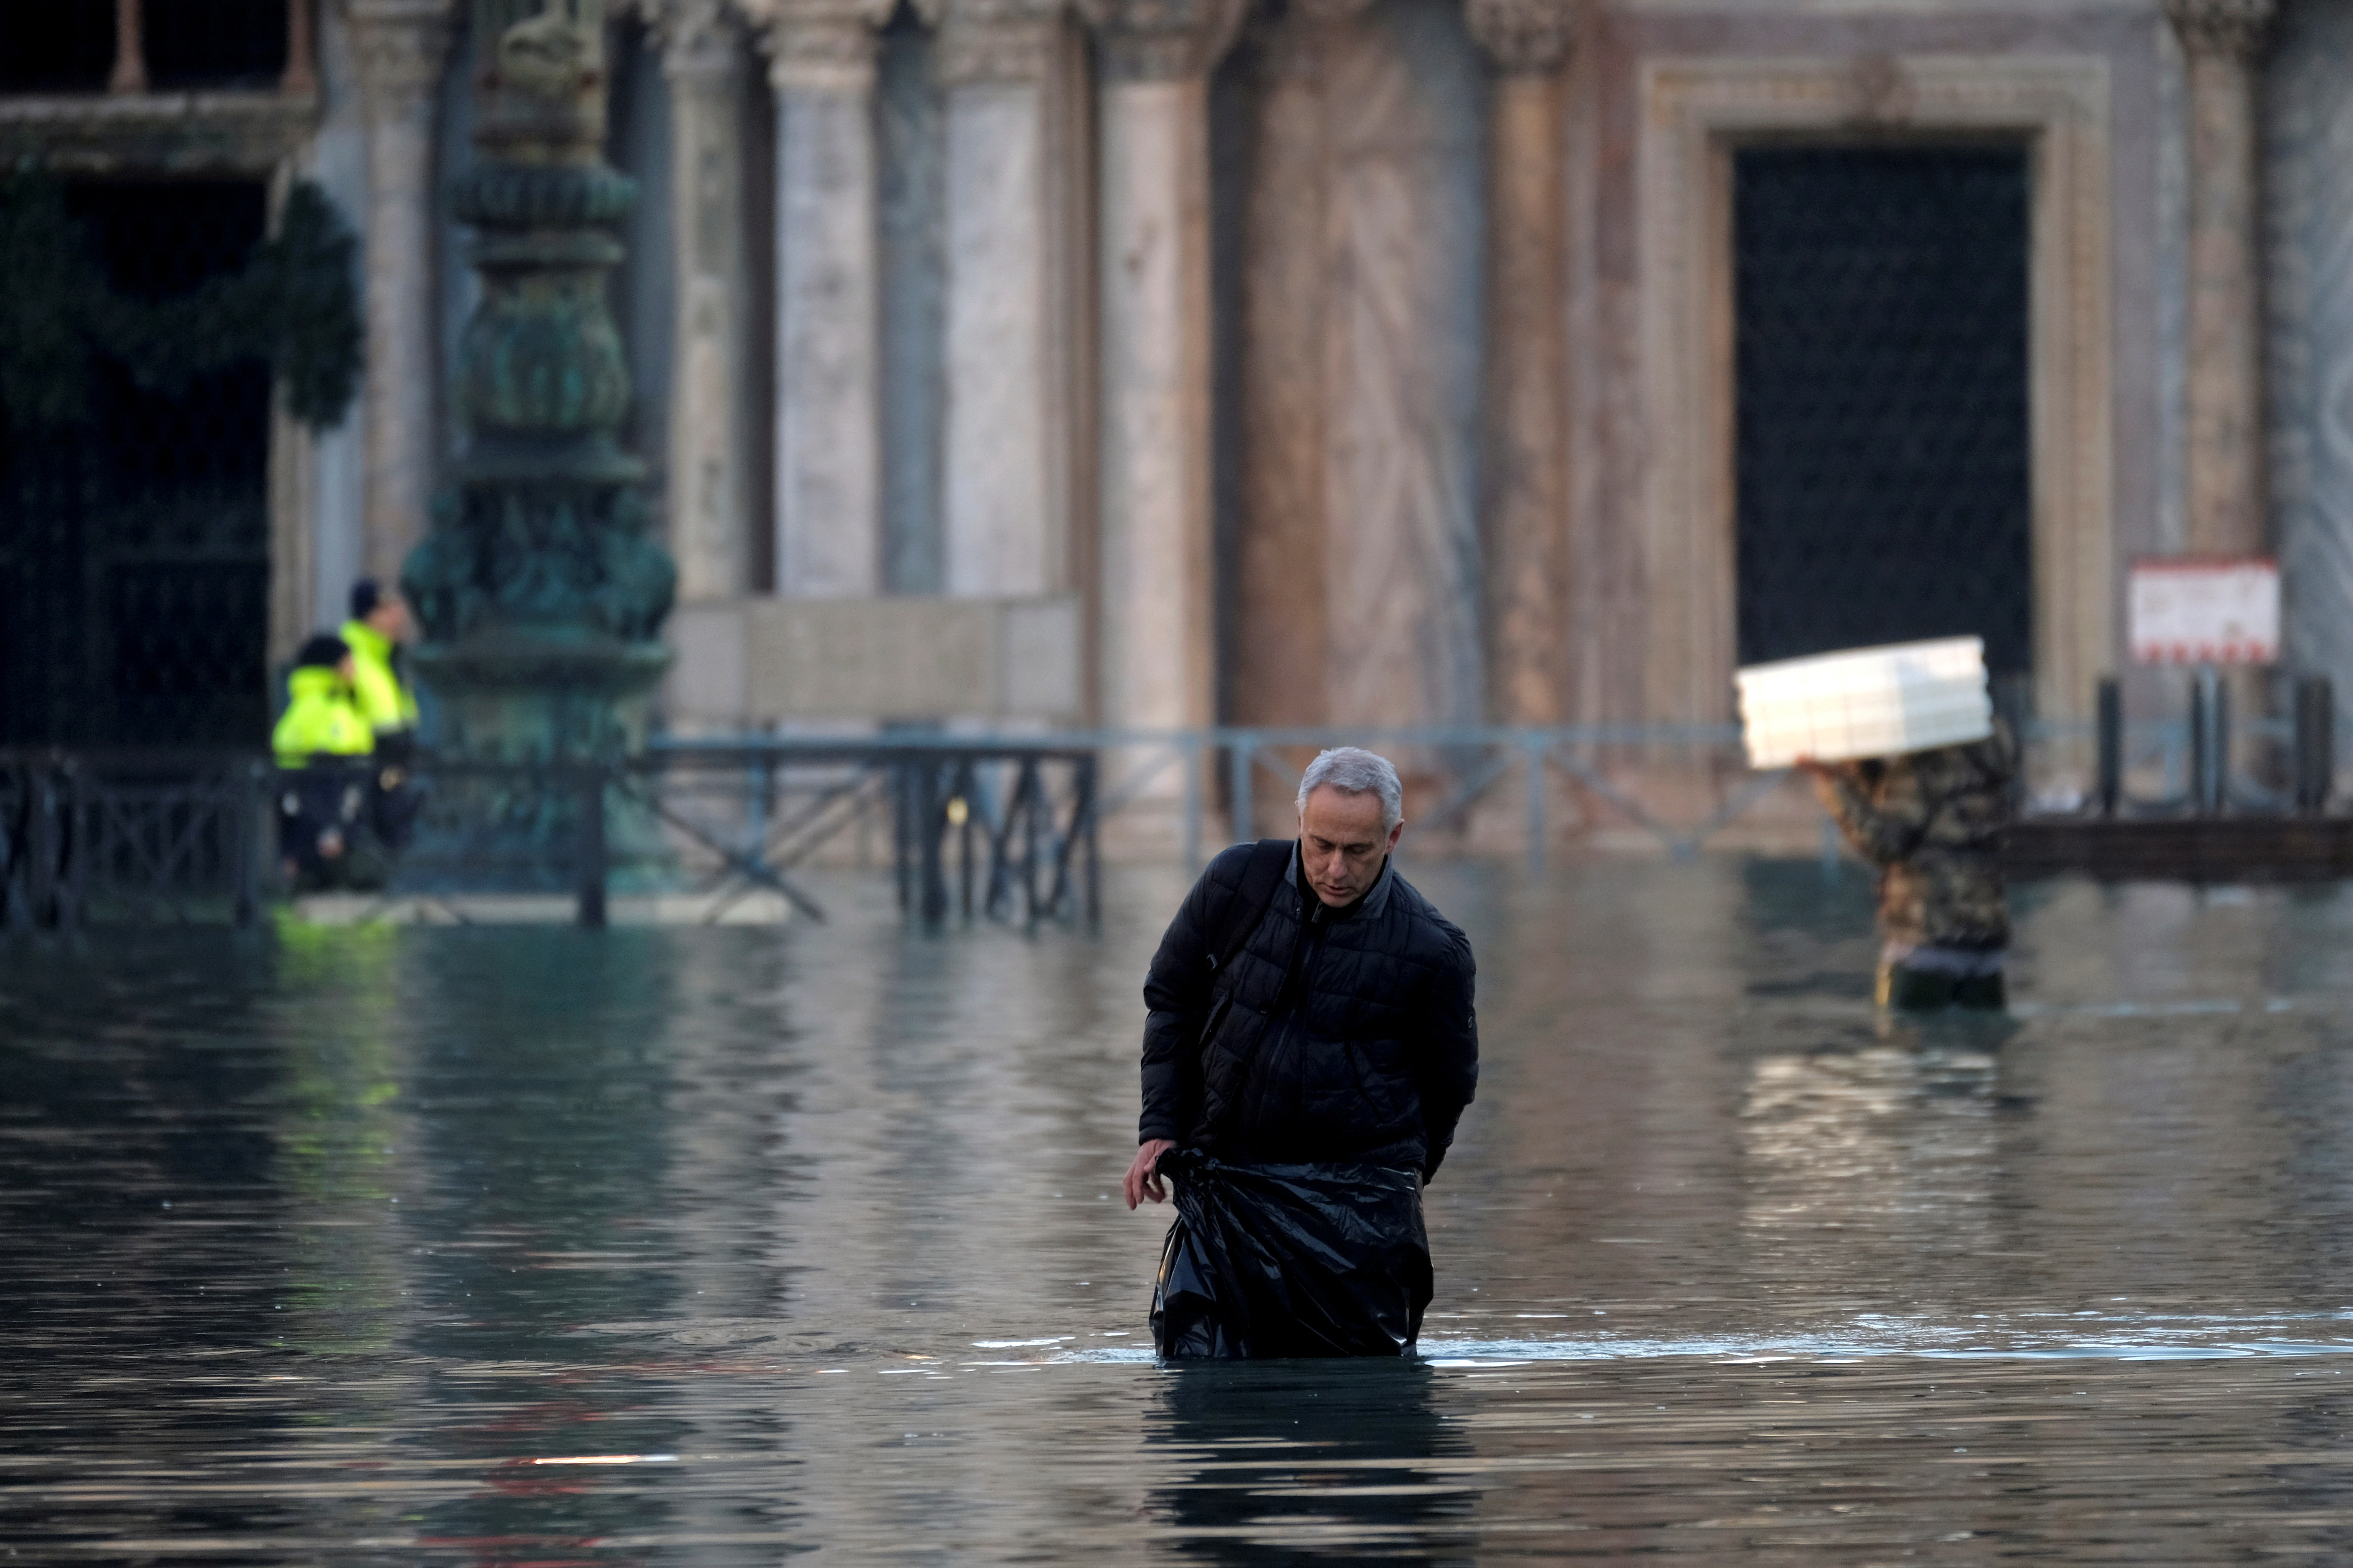 Un hombre camina a través de una calle inundada hacia la Plaza de San Marcos (REUTERS/Manuel Silvestri)